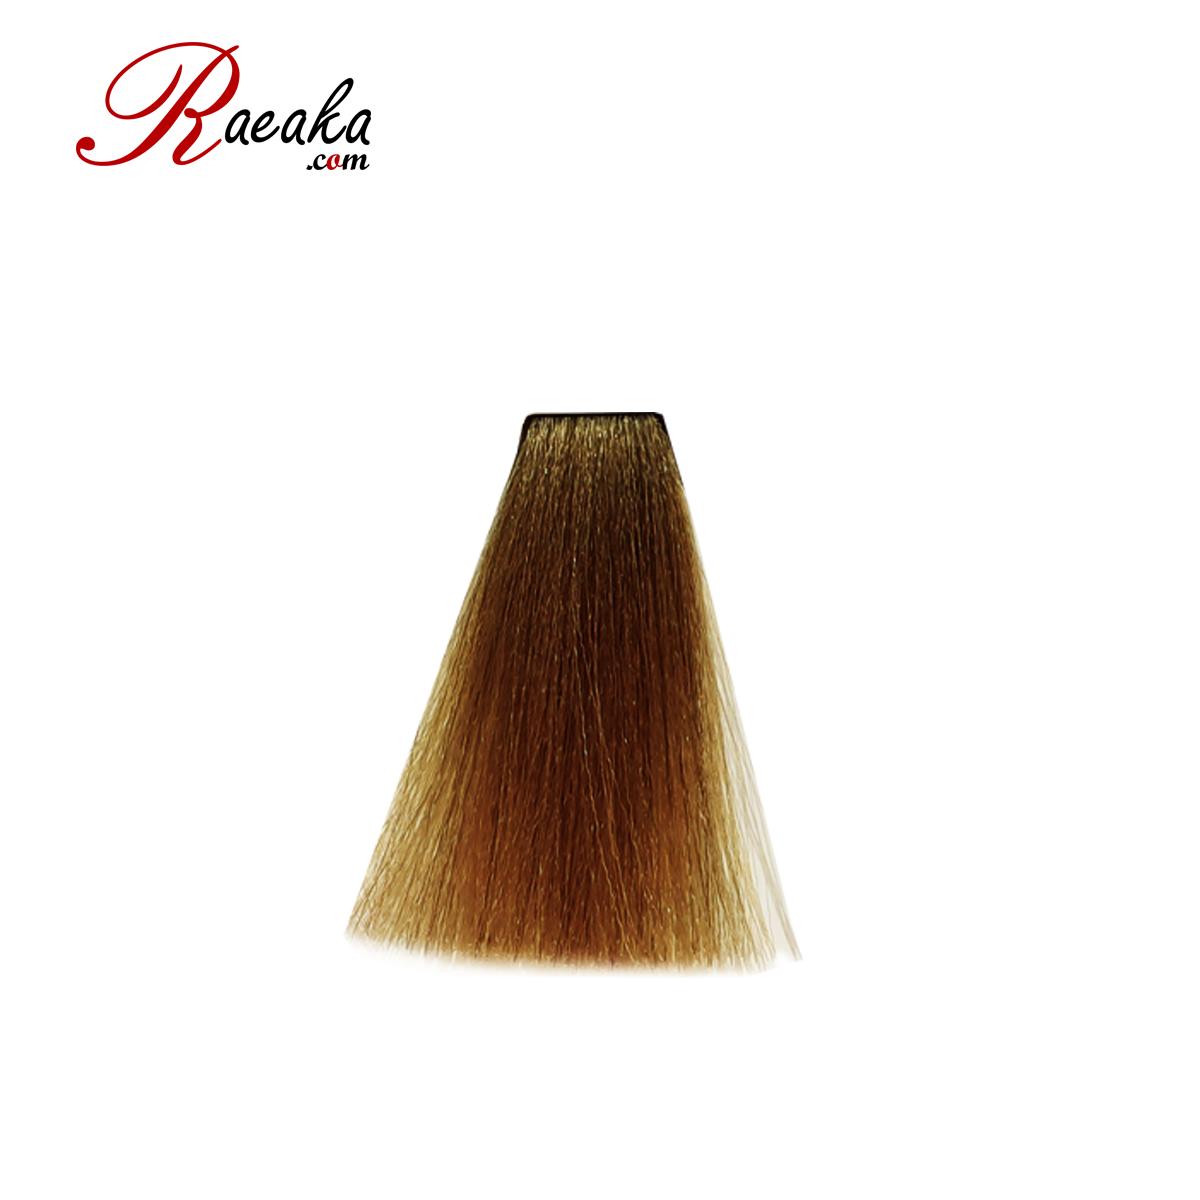 رنگ مو دوماسی سری عسلی بلوند عسلی تیره ۶٫۳۴ حجم ۱۲۰ میلی لیتر